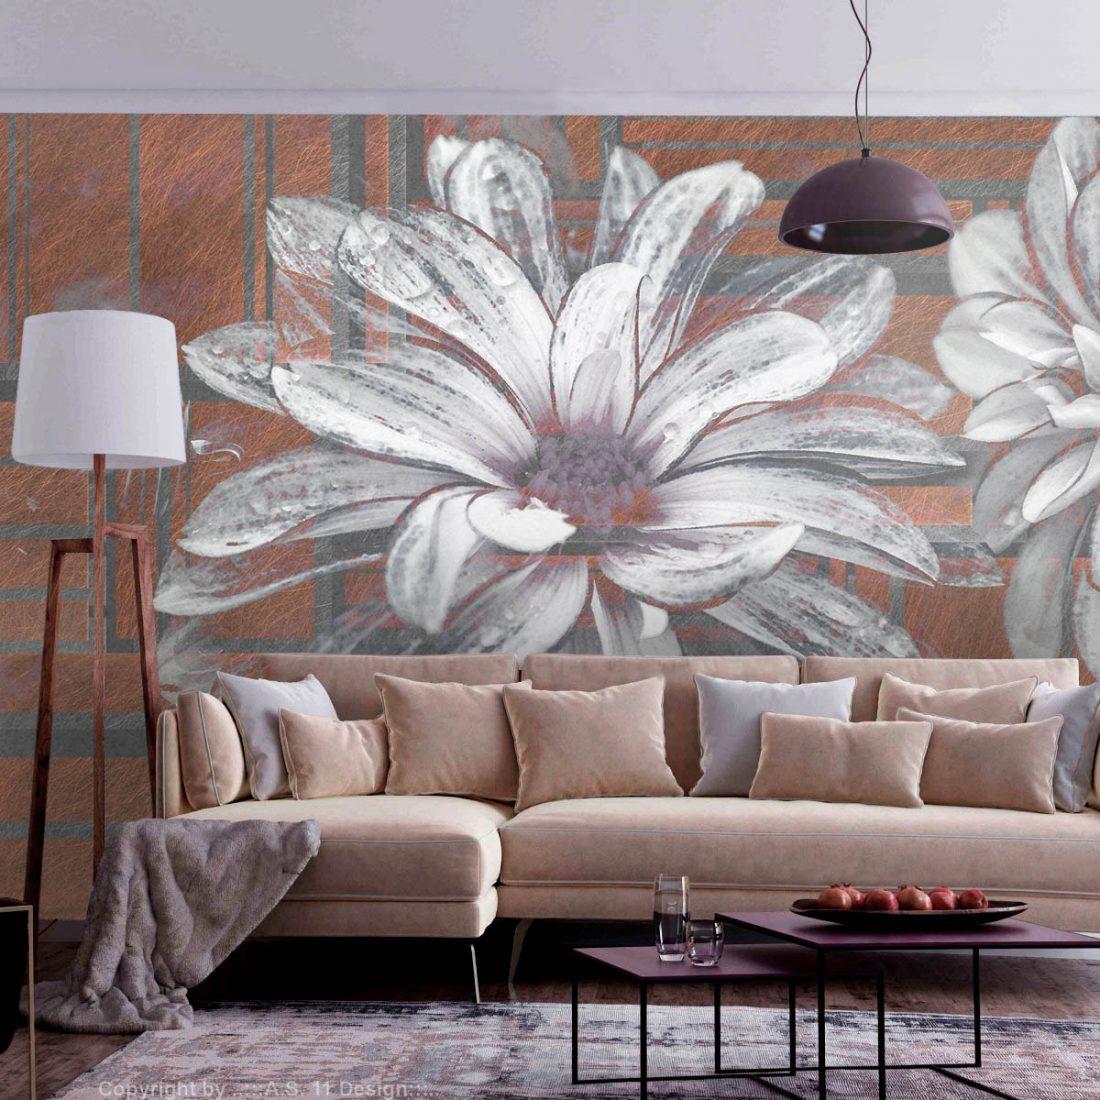 Muraia_Floral Alternative_M133PH